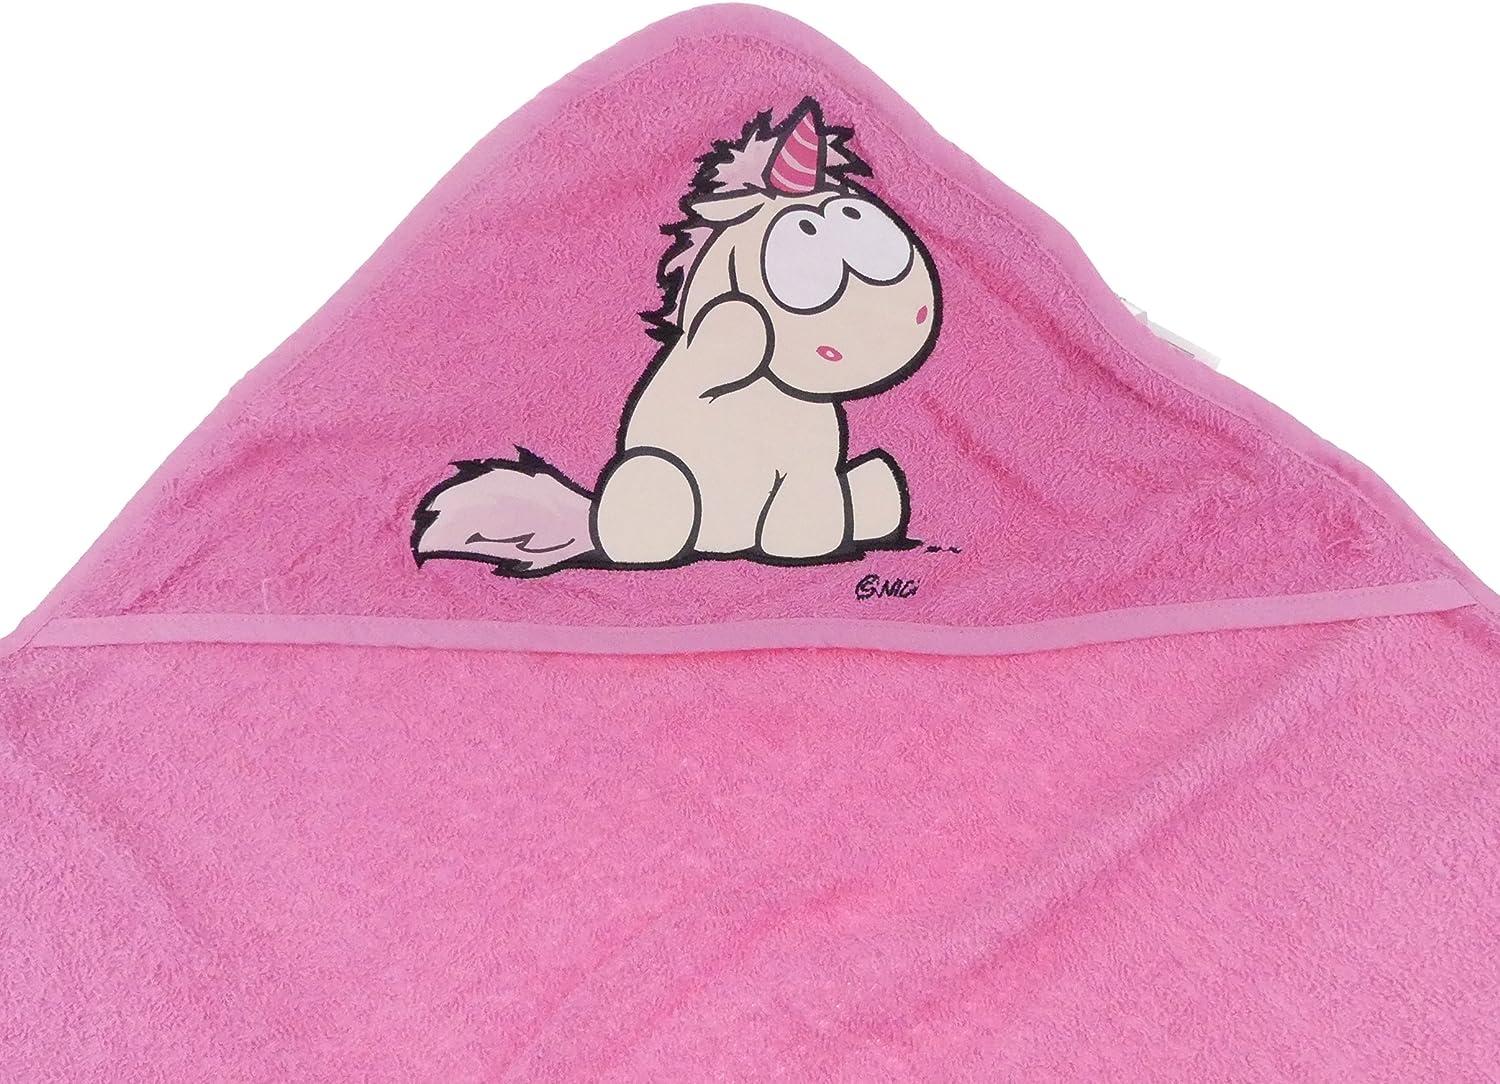 months TVM Europe GmbH Nici Theodor /& Friends Bath Towel 75/x 75/Hooded Baby Bath Poncho 100/% cotton Infants Age 0/